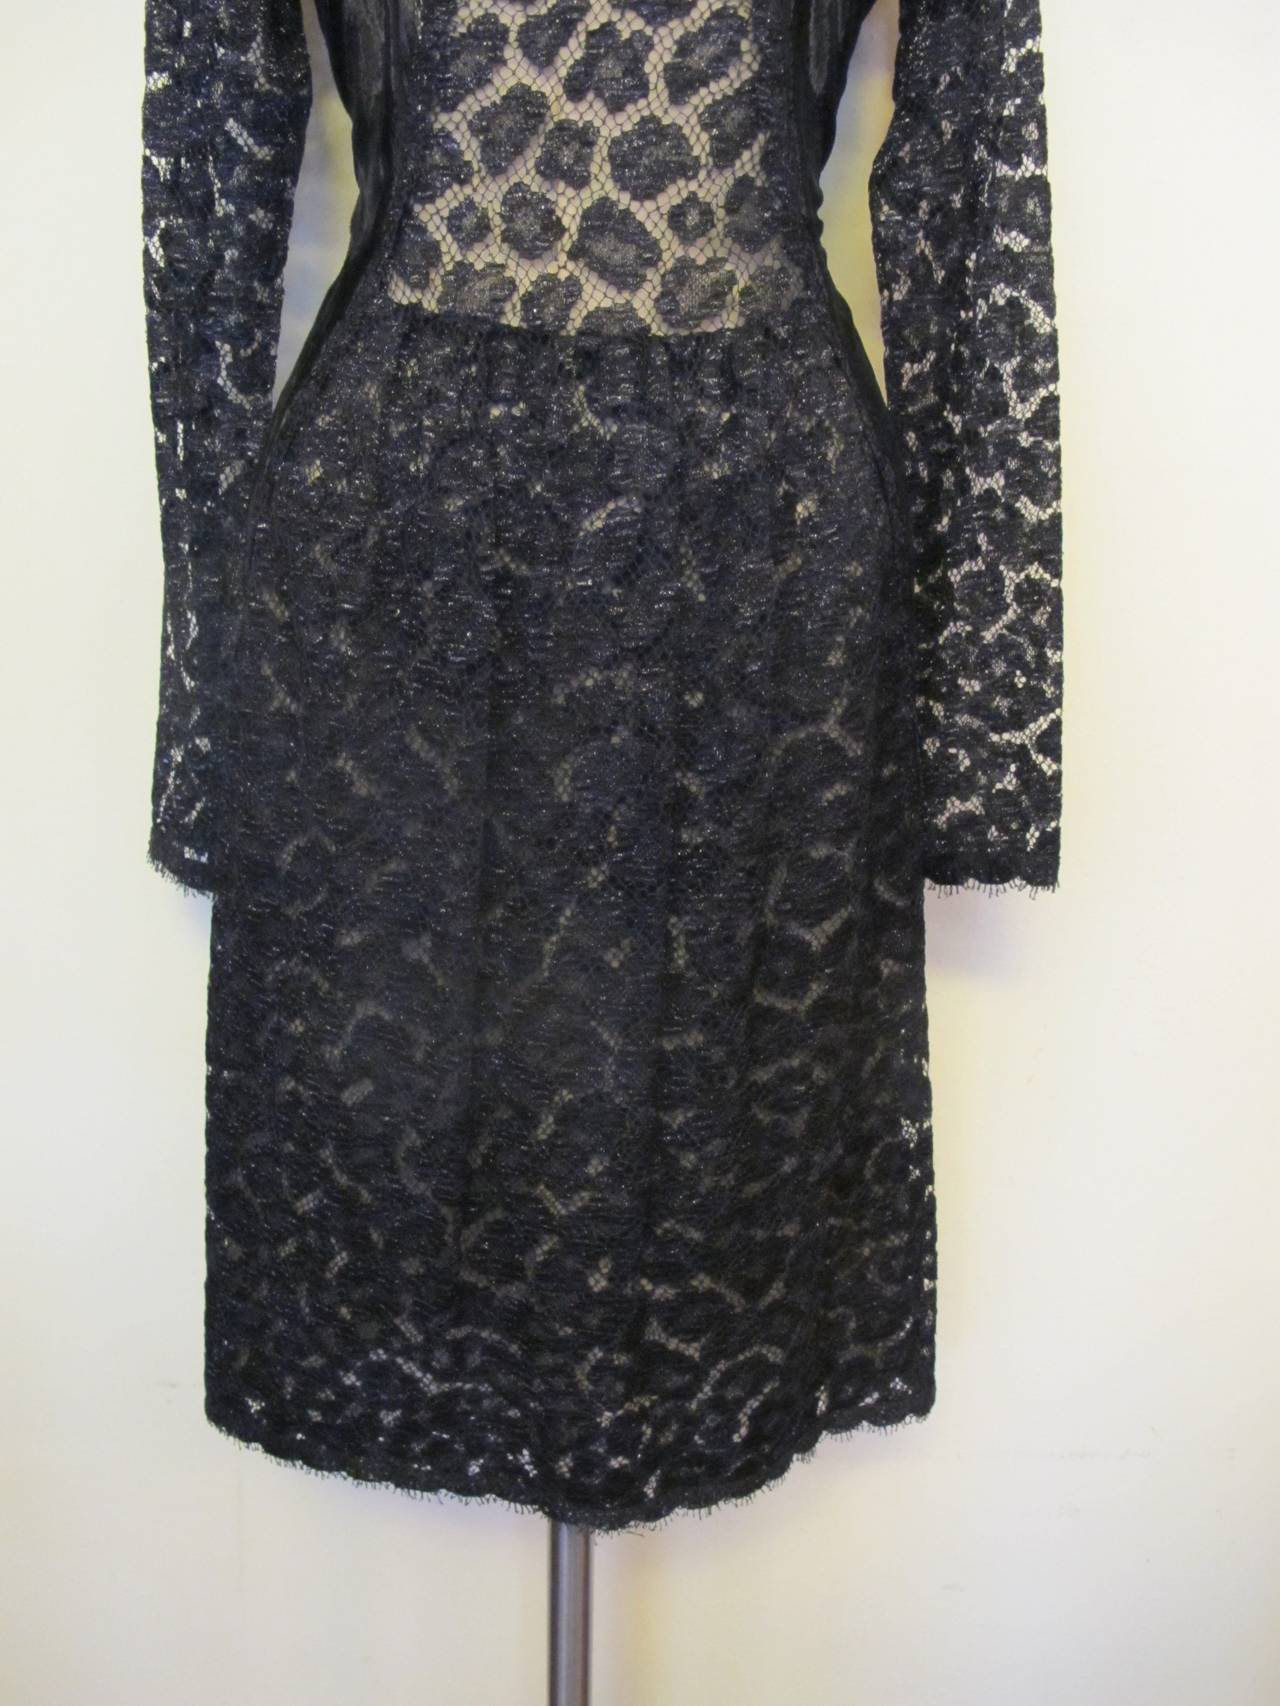 Geoffrey Beene Black Lace Cocktail Dress with Leopard Design 7